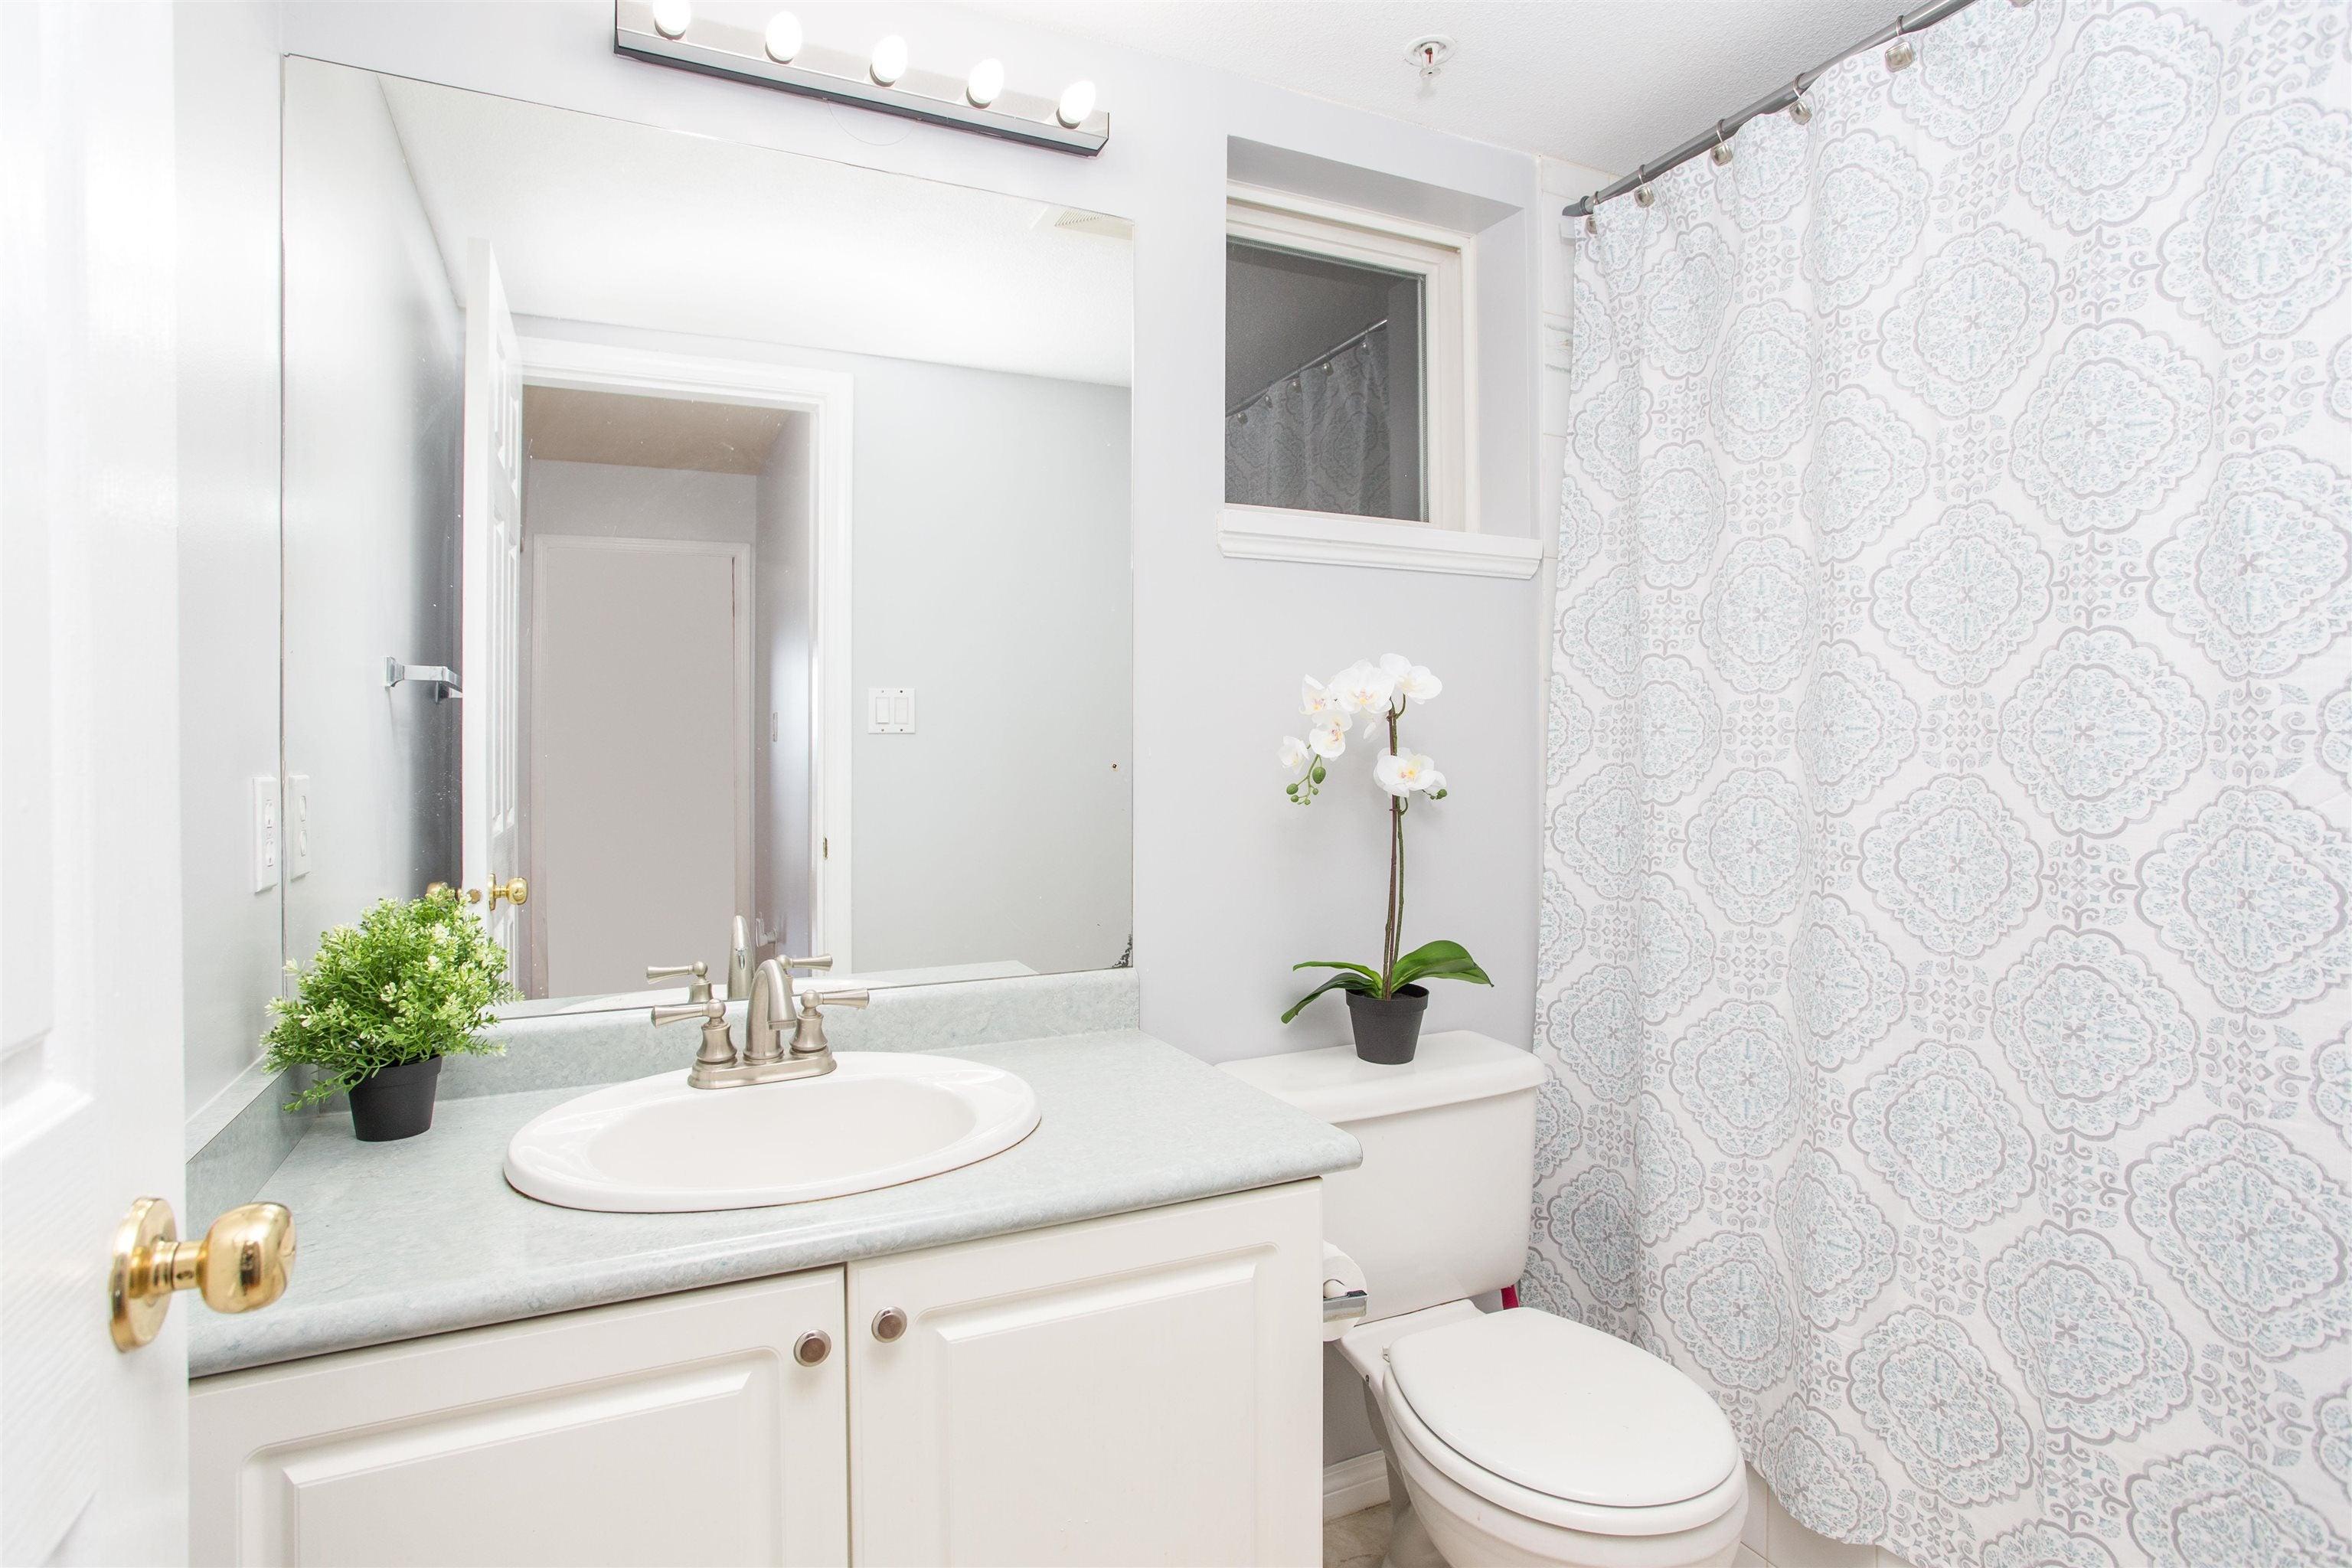 7 205 LEBLEU STREET - Maillardville Apartment/Condo for sale, 3 Bedrooms (R2625671) - #19